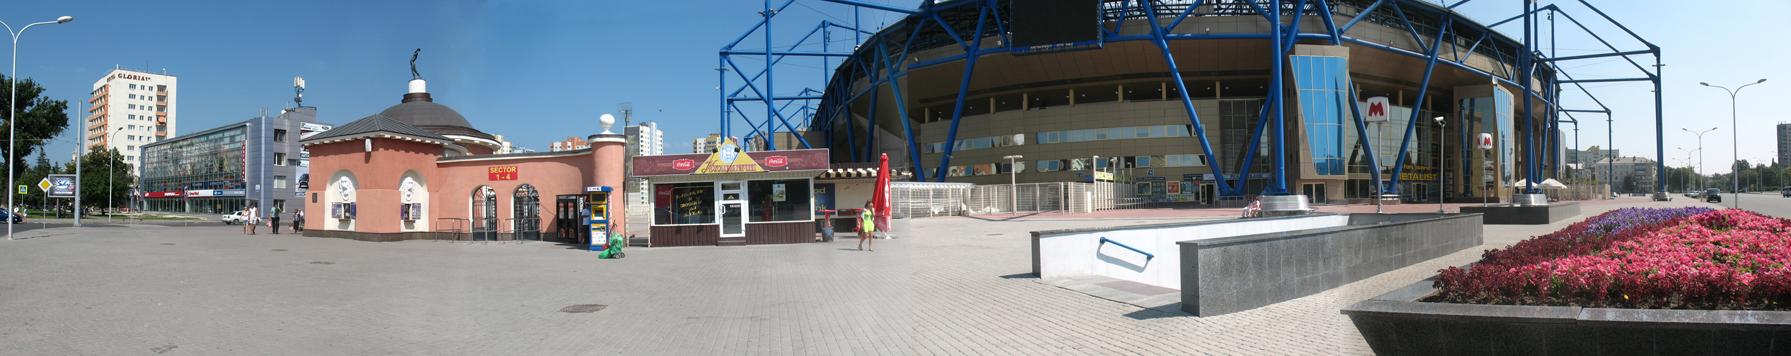 панорама стадиона Металлист_panorama stadiona Metallist__